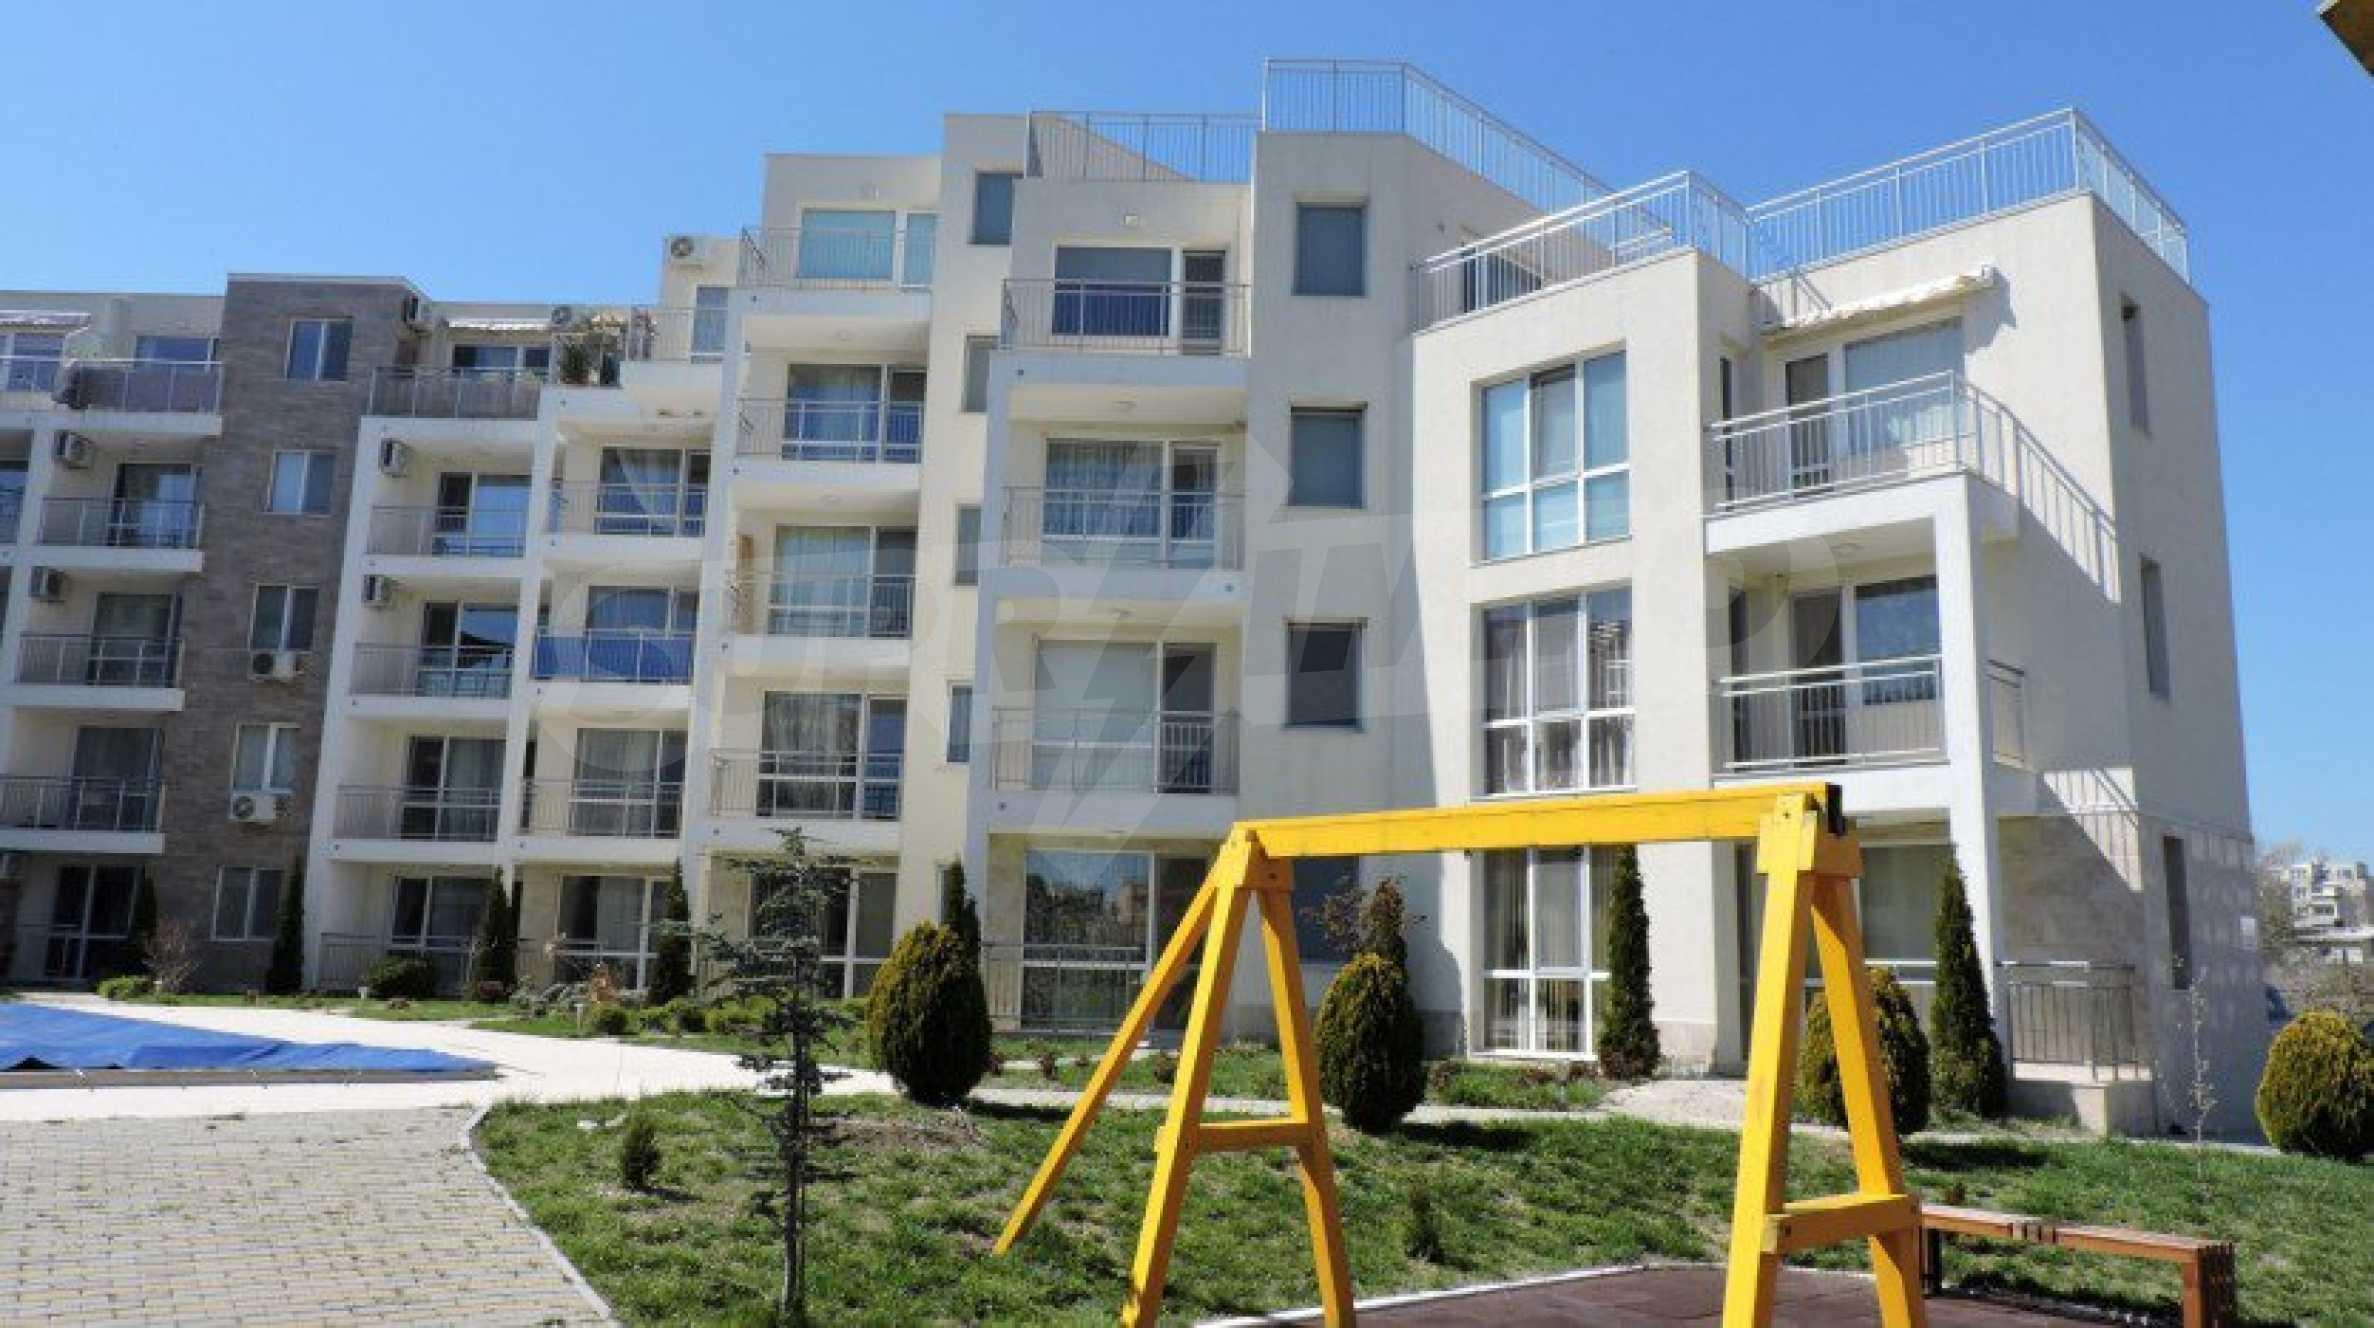 Тристаен апартамент близо до плажа в Бяла 15